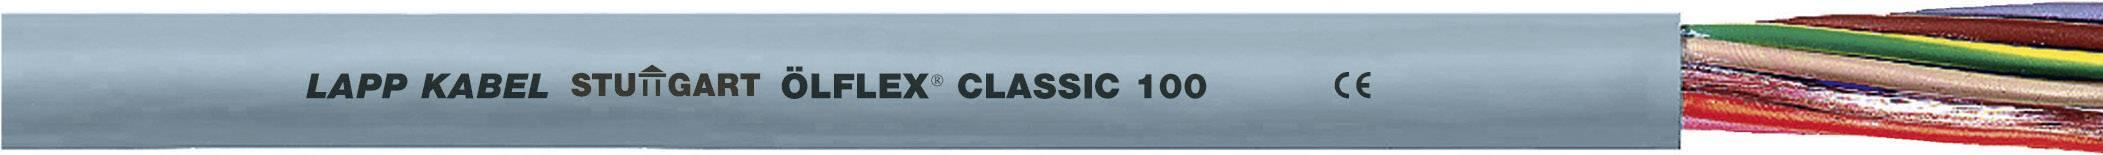 Kabel LappKabel Ölflex CLASSIC 100 14G0,5 (0010009), PVC, 9,5 mm, 500 V, šedá, 1000 m